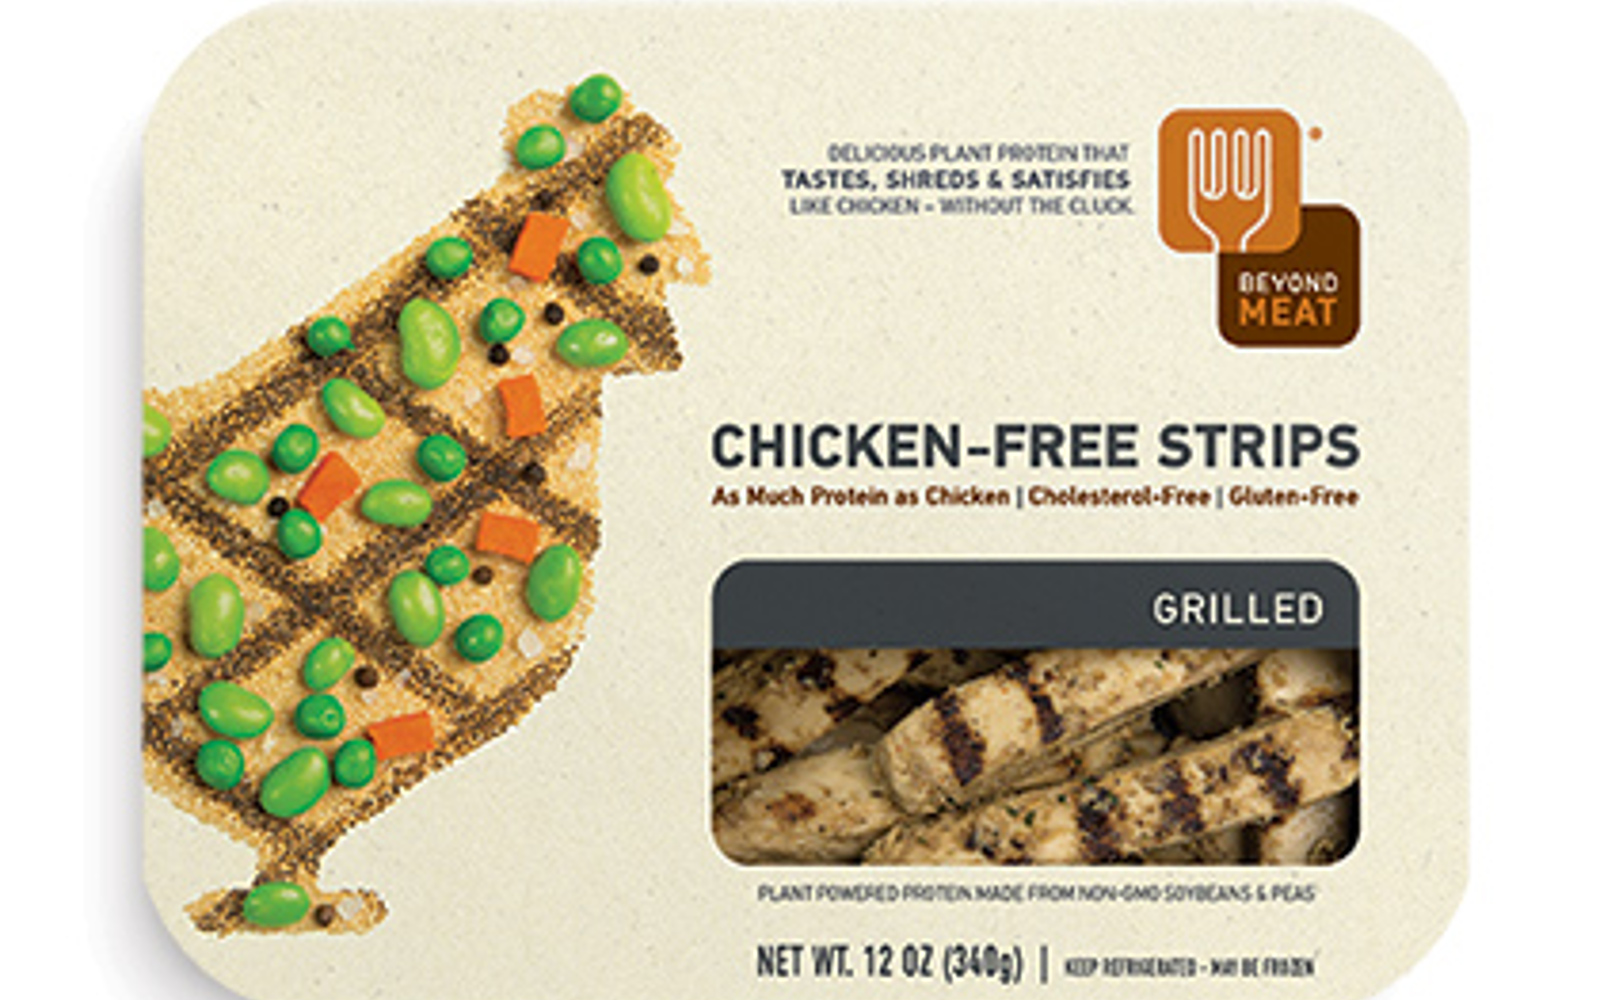 Beyond Meat Chicken Strips